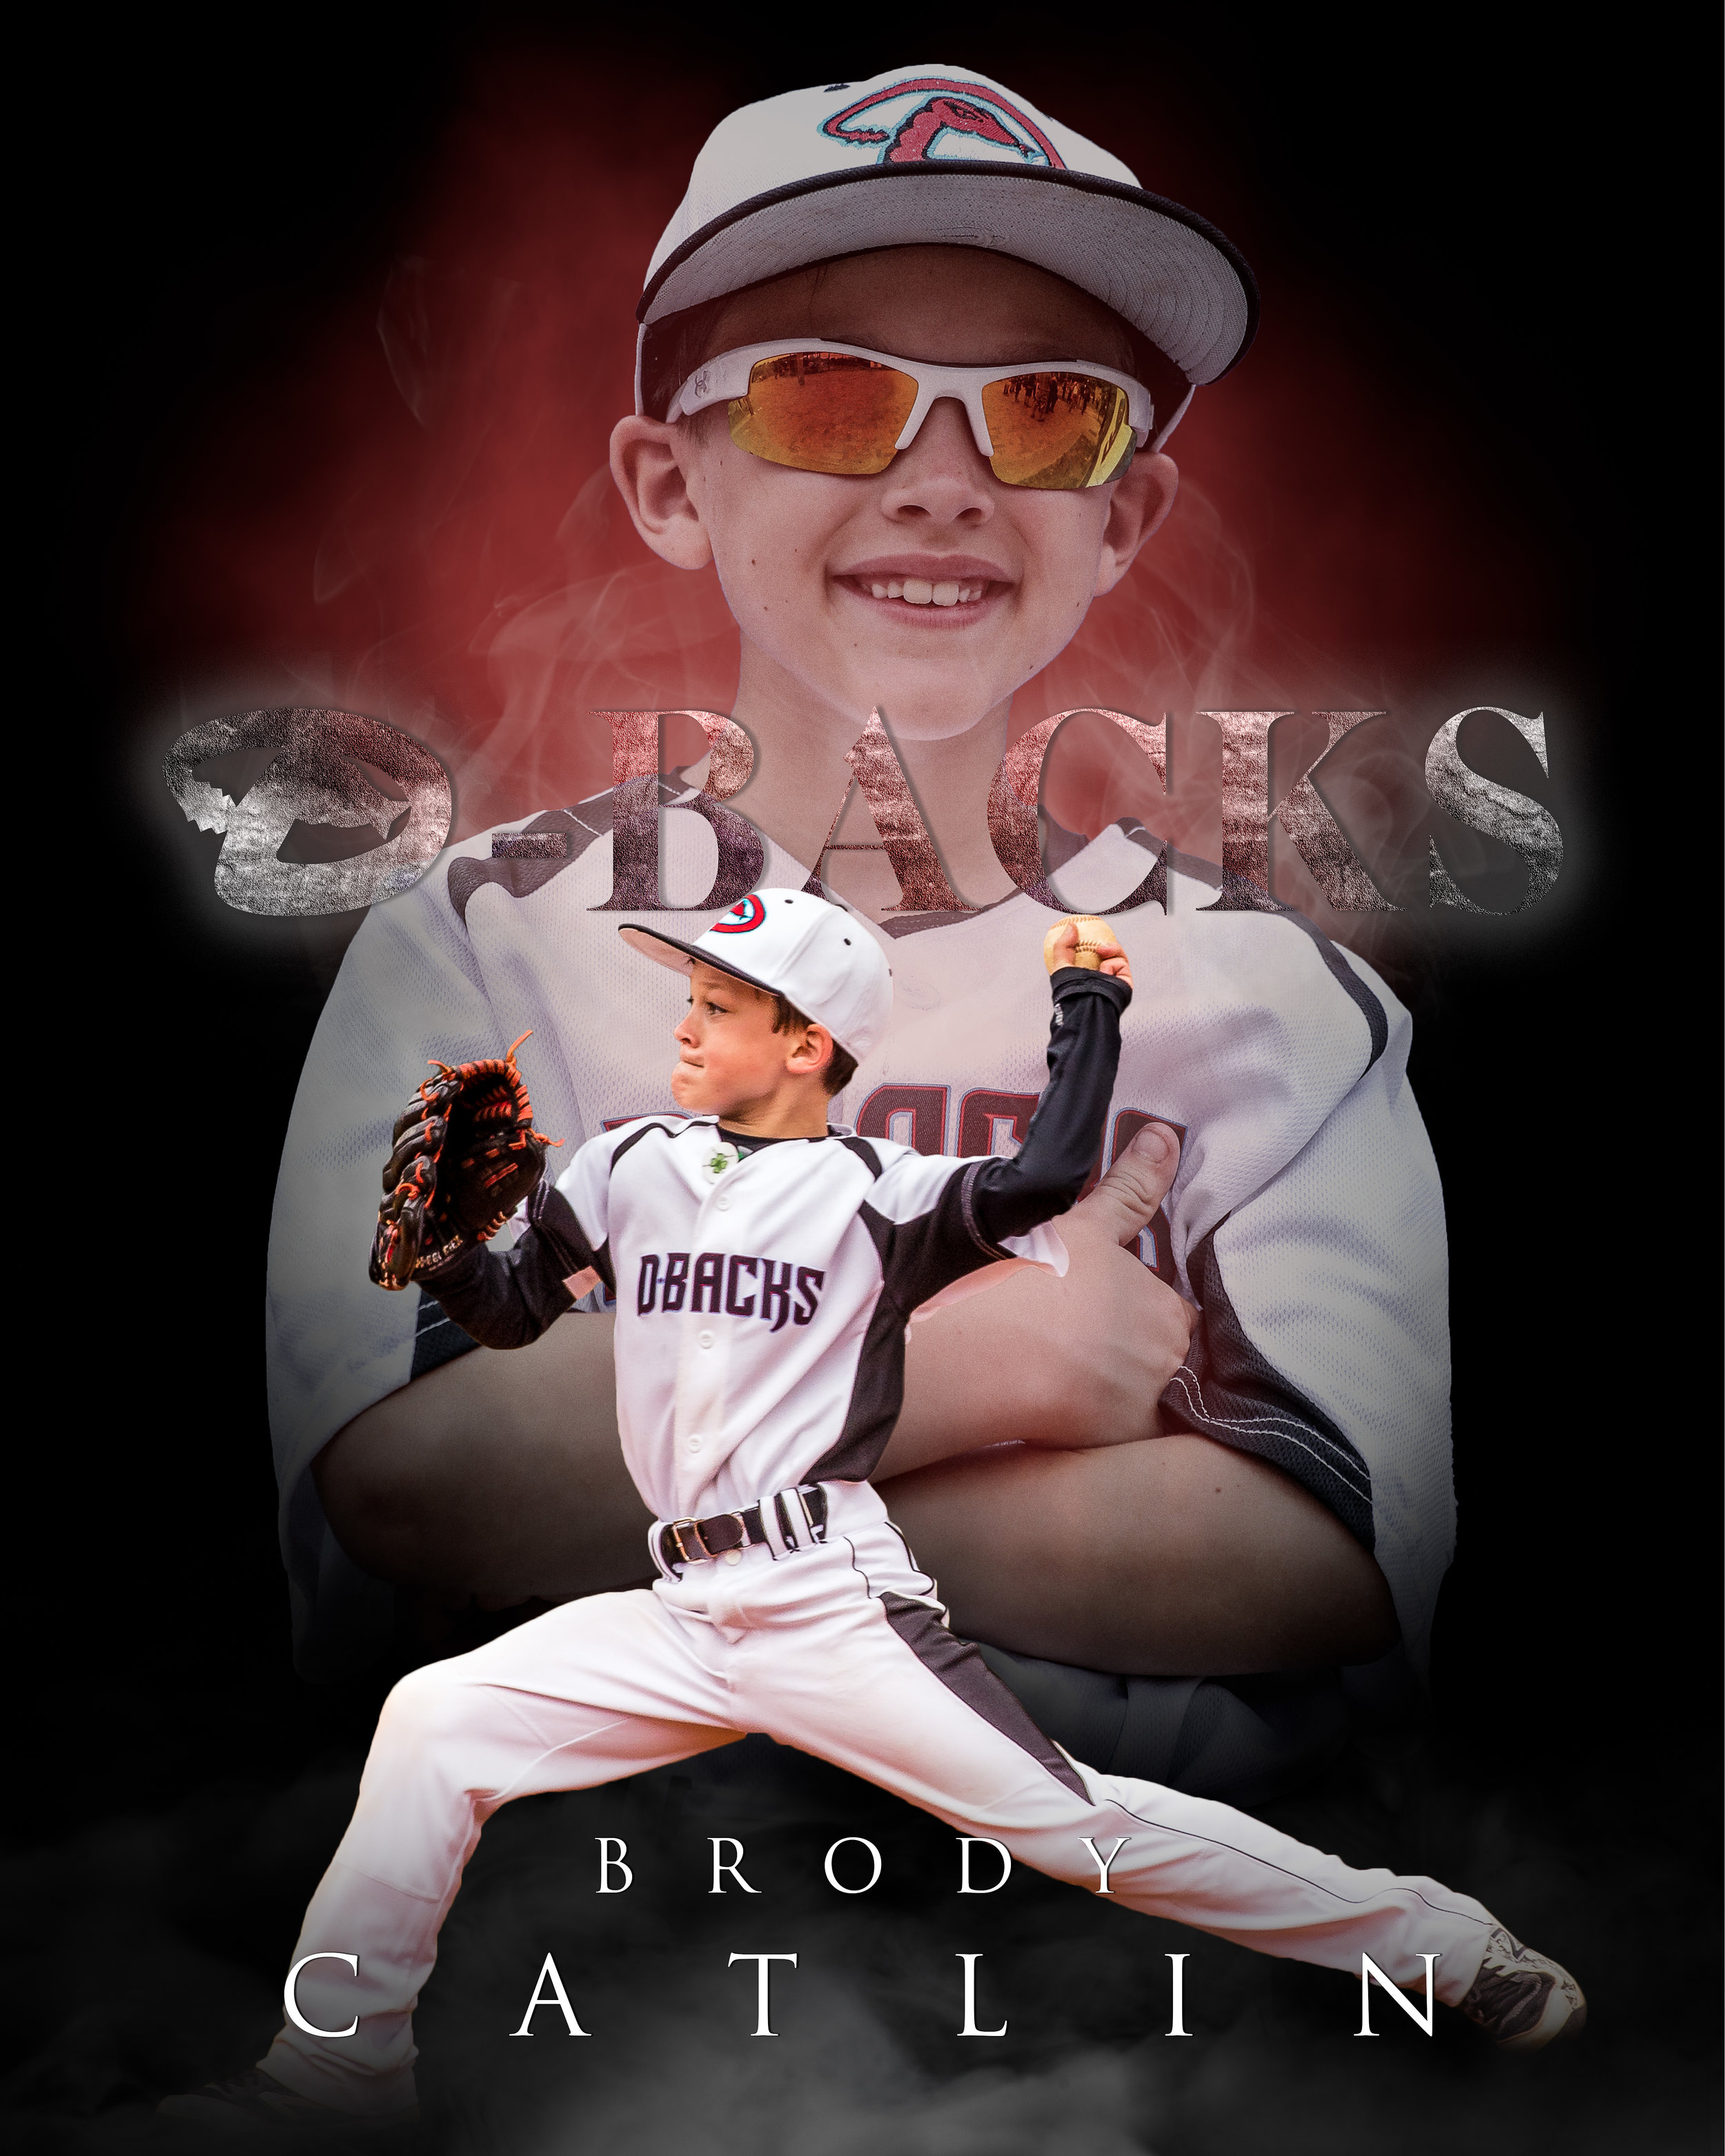 Brody Catlin Poster 16x20.jpg